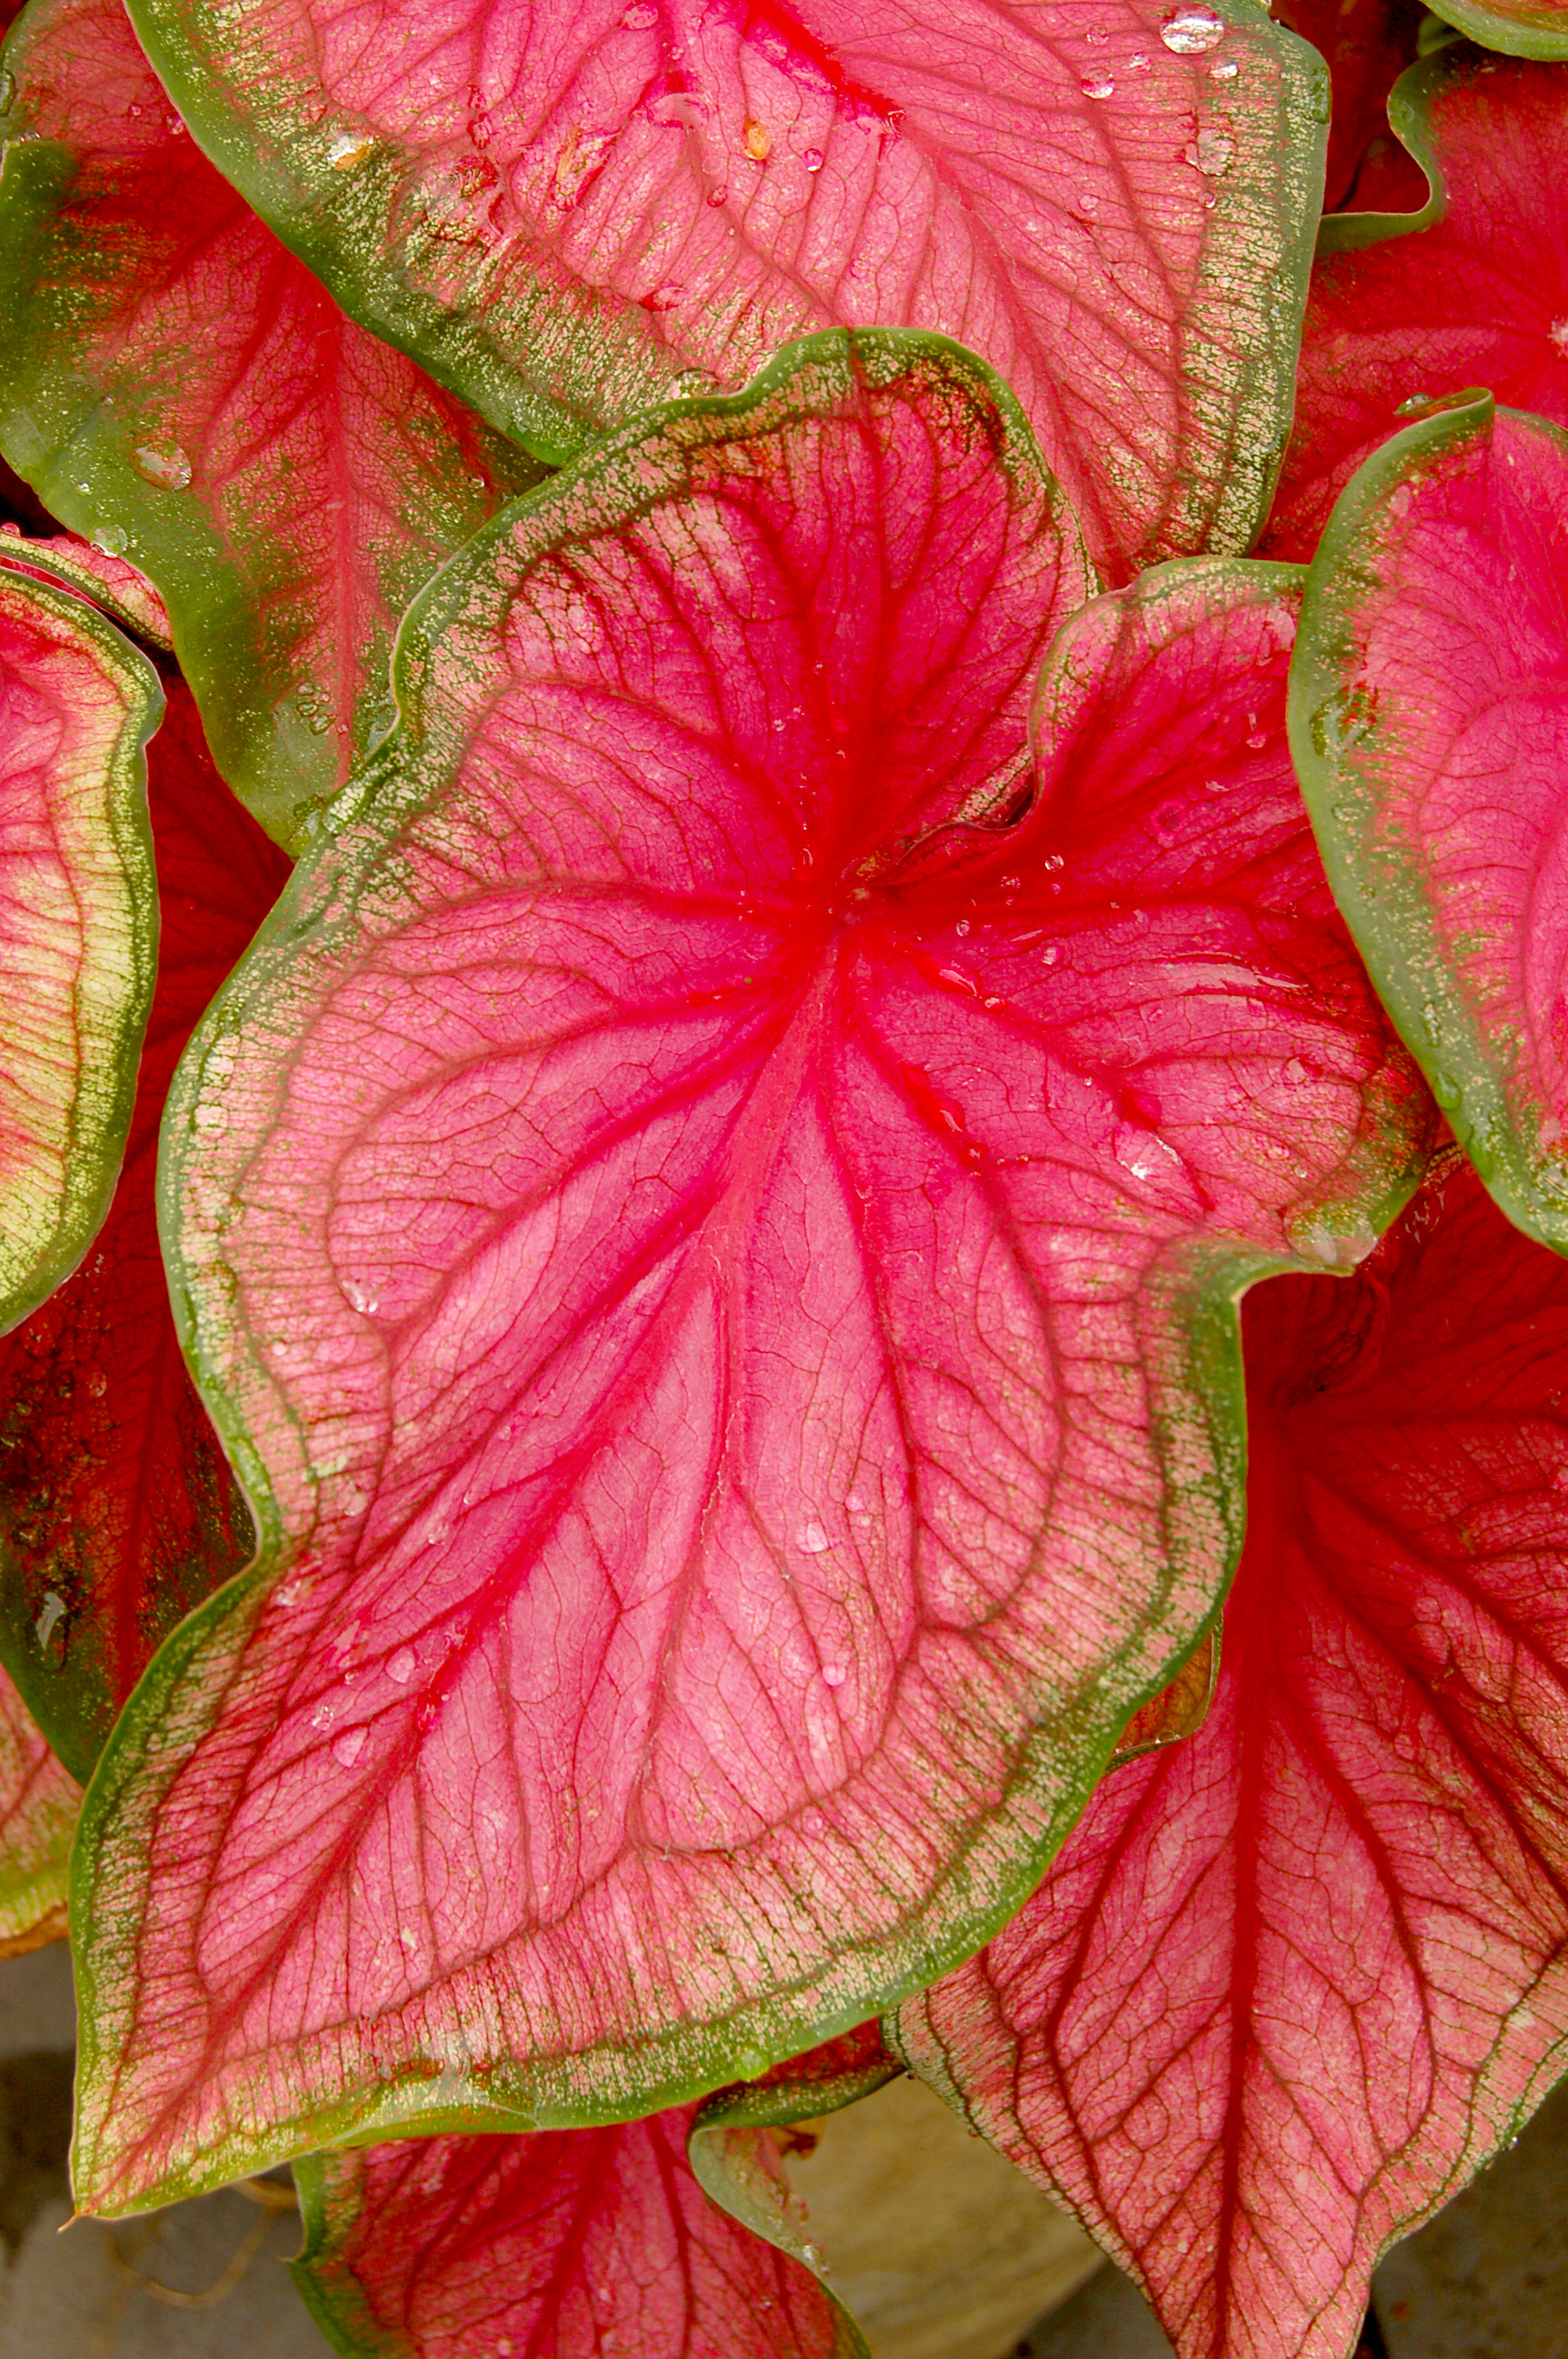 File:Caladium bicolor 'Florida Sweetheart' Leaf 2000px.jpg - Wikimedia Commons